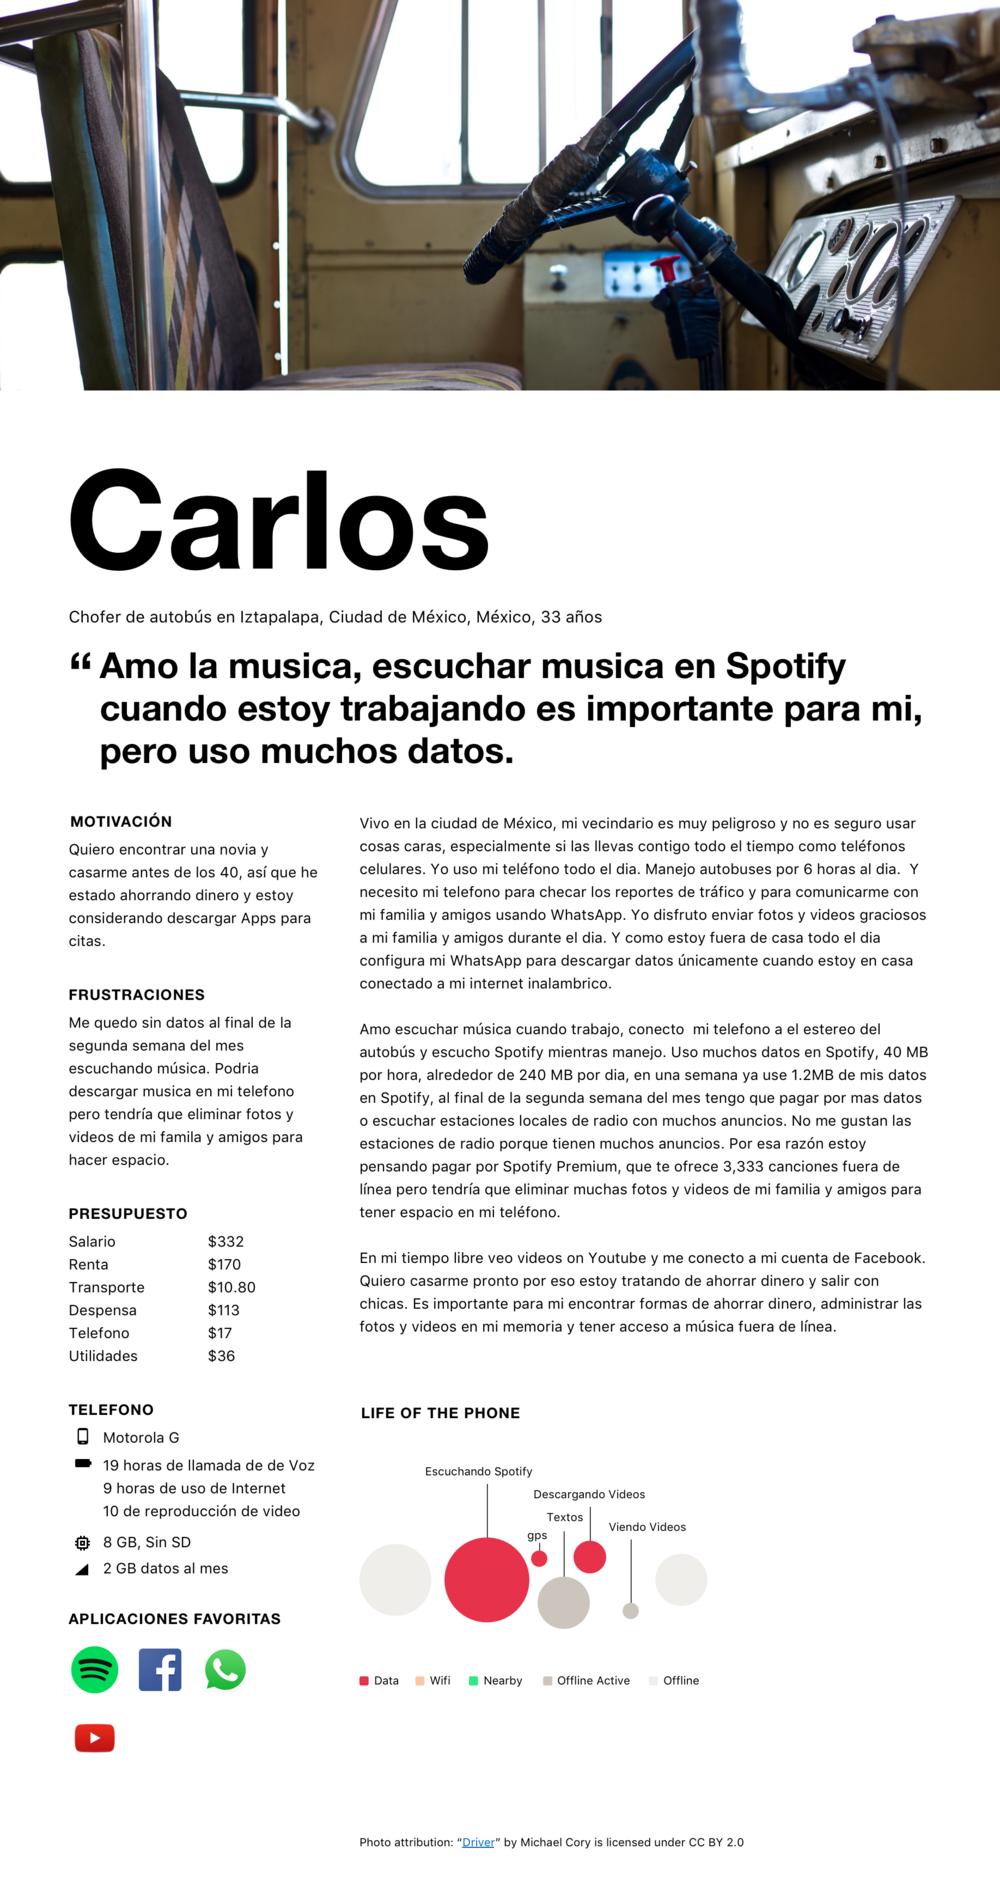 ux-persona-mexico-Carlos@3x.png